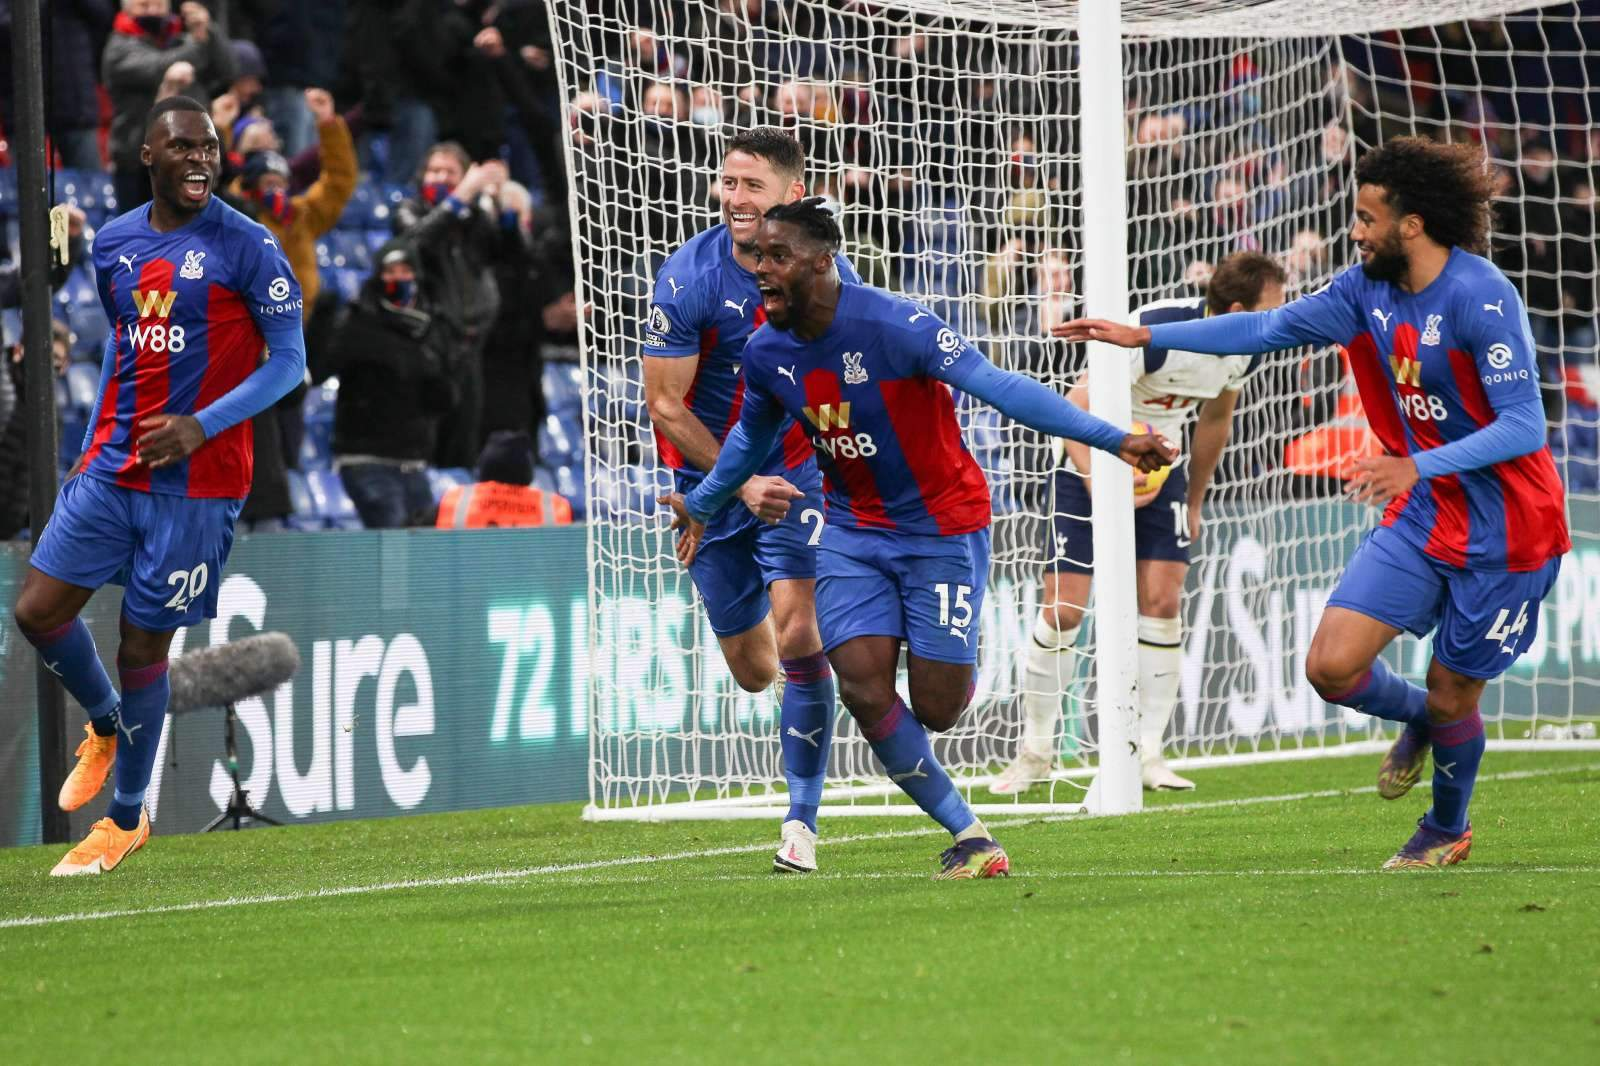 «Кристал Пэлас» без труда справился с «Шеффилд Юнайтед»